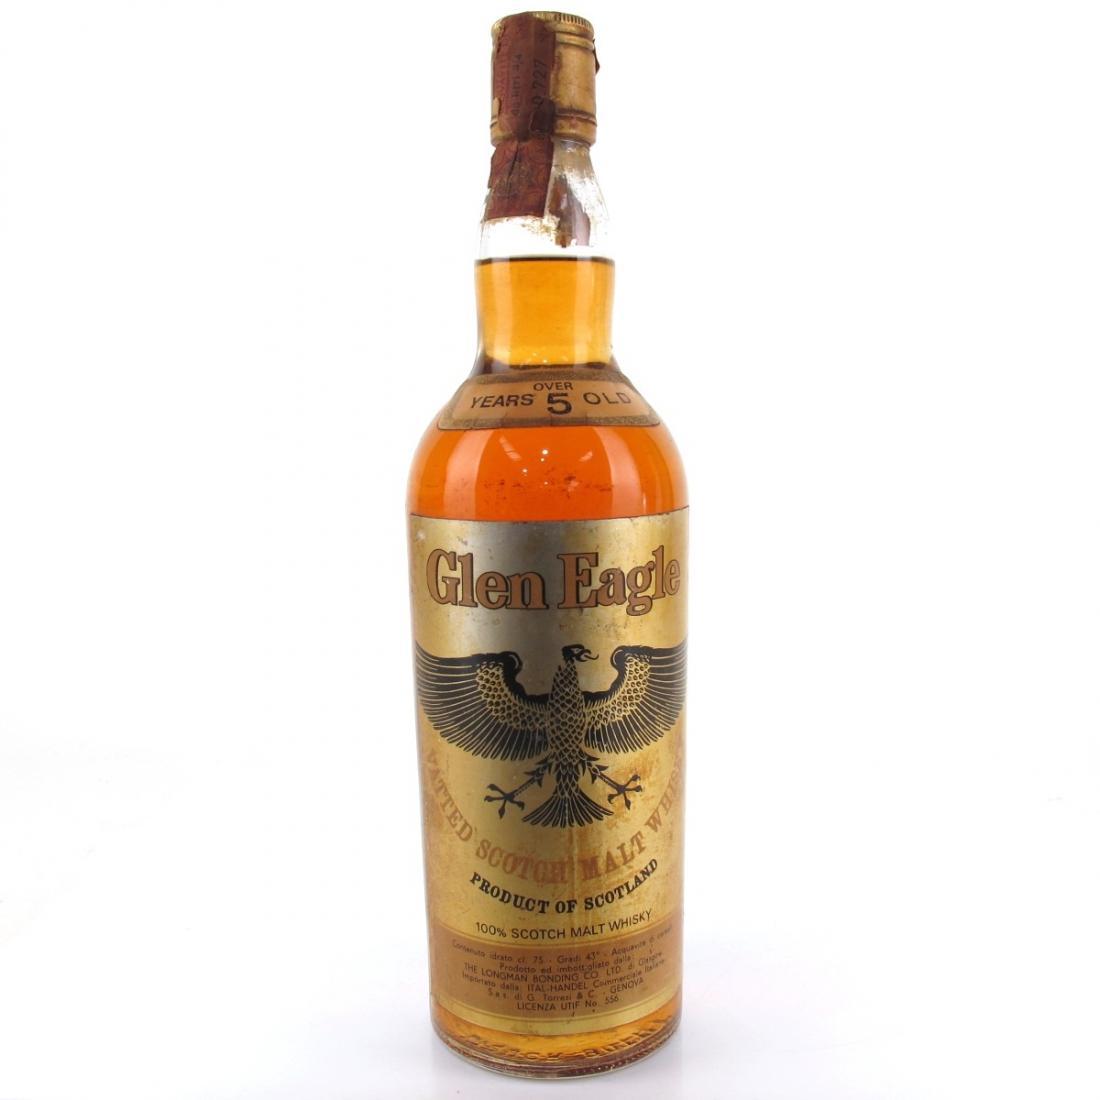 Glen Eagle 5 Year Old Scotch Whisky 1960s